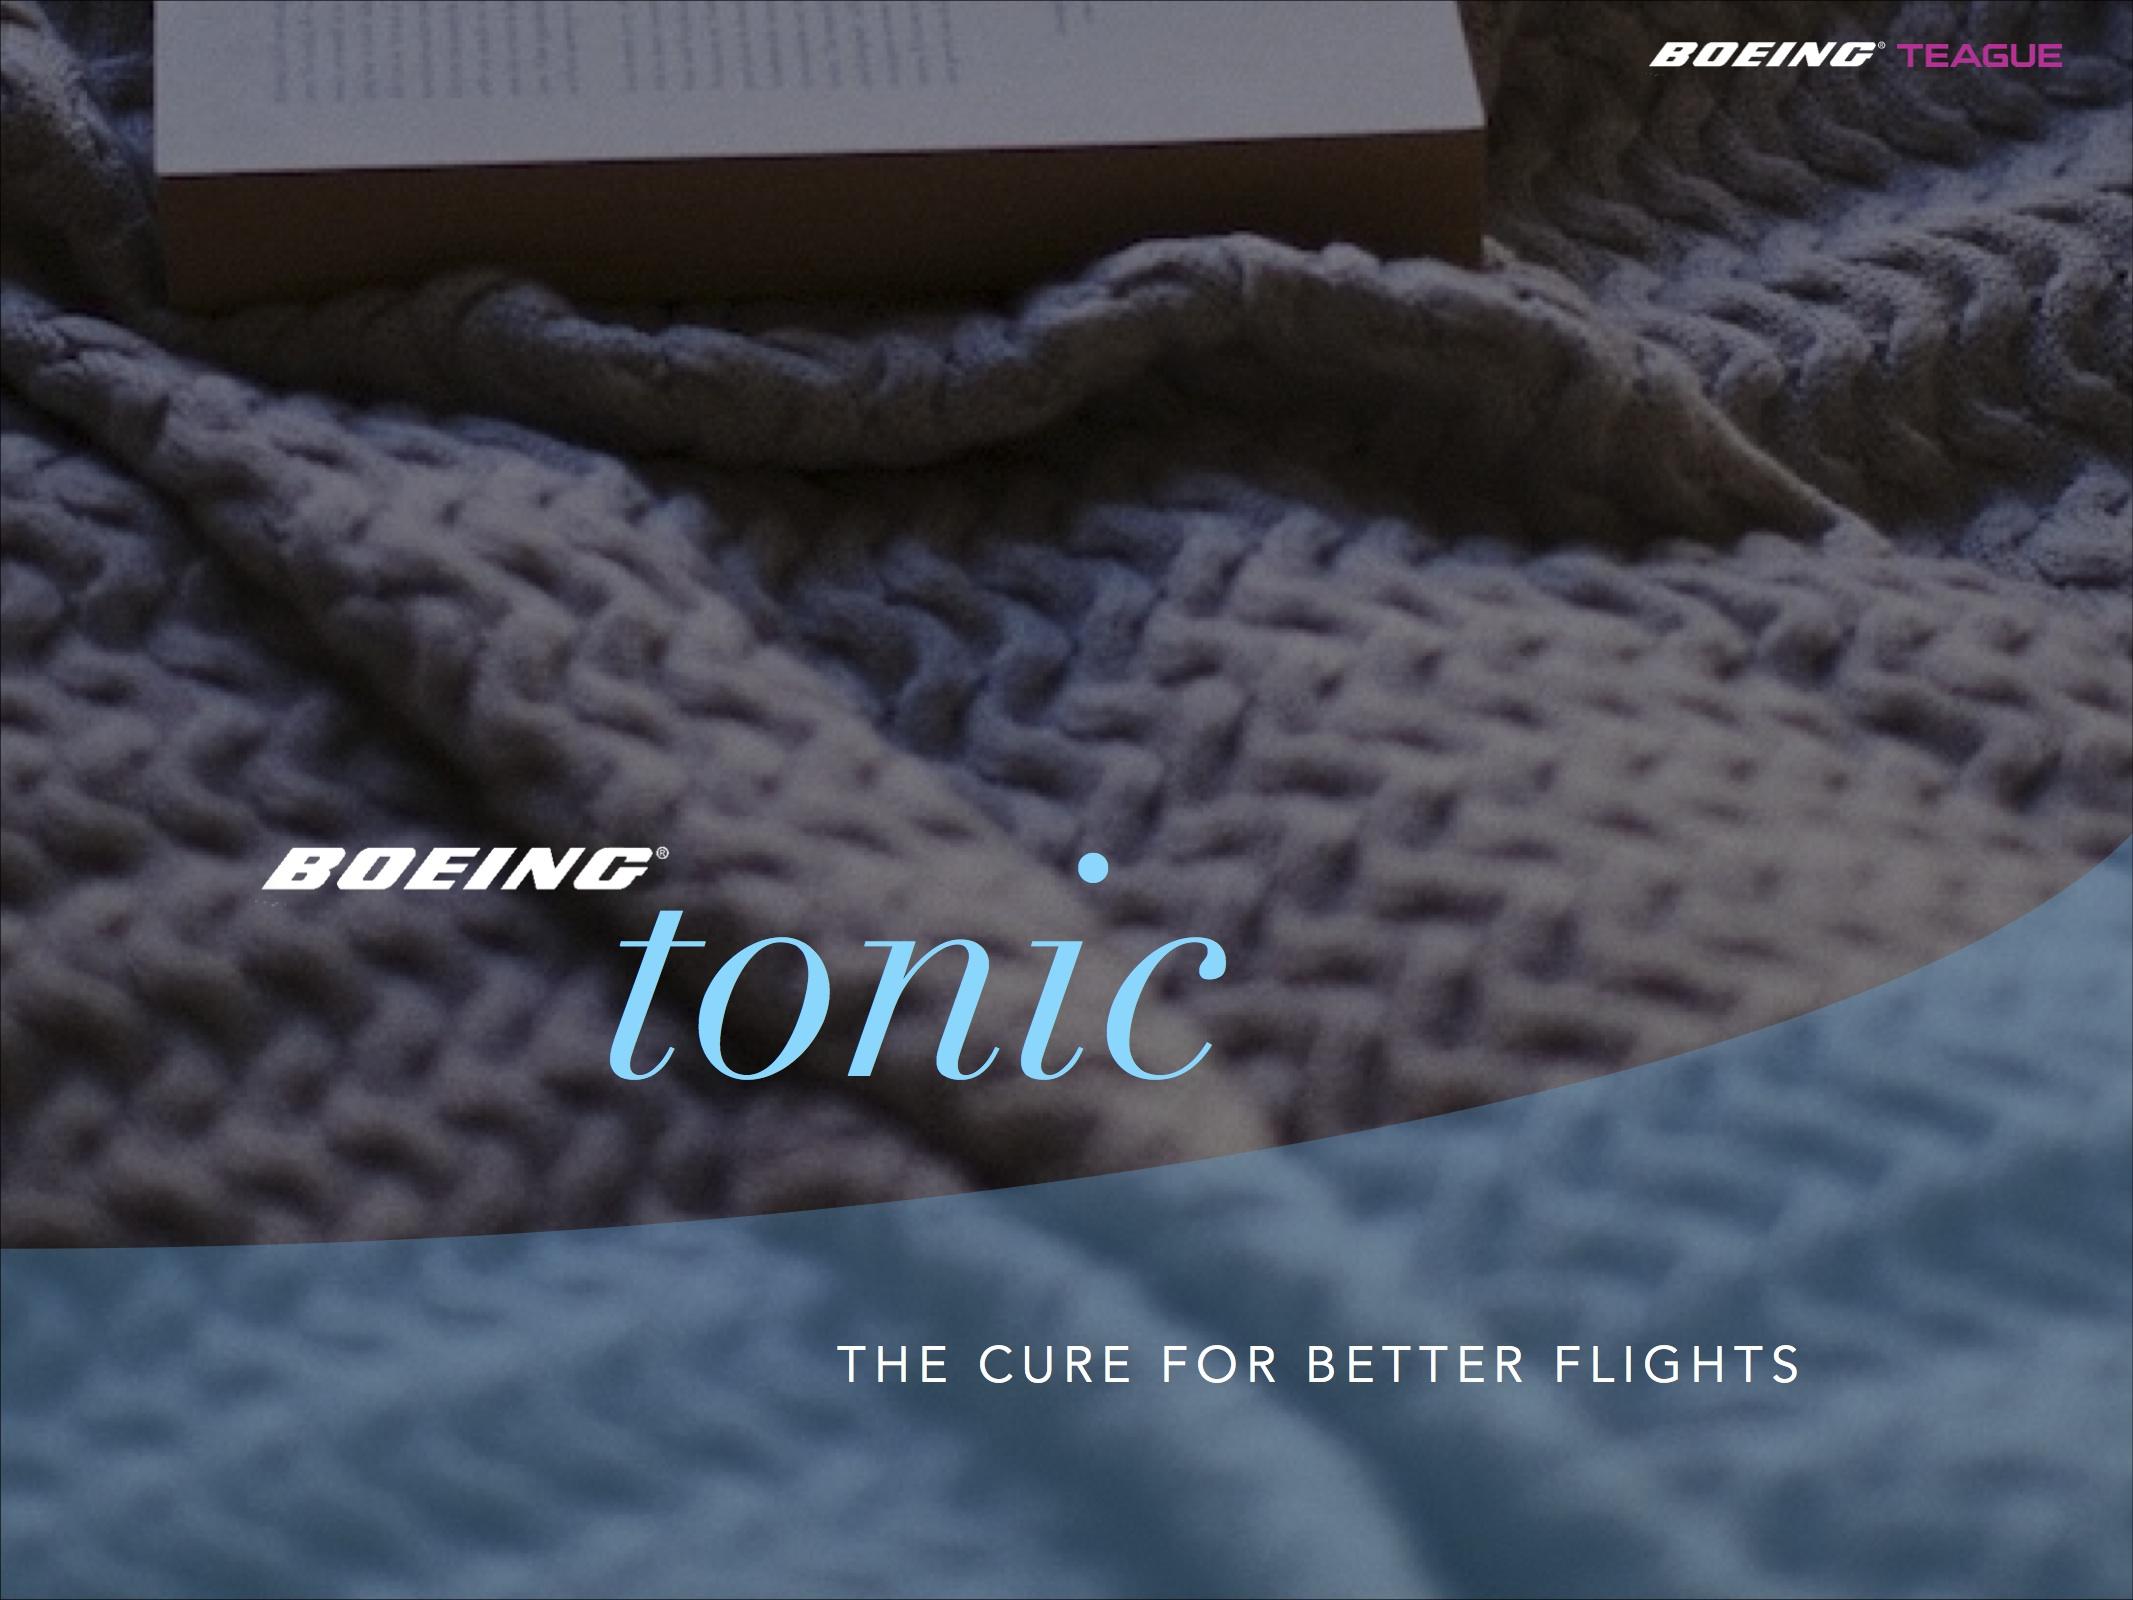 boeing_tonic2.jpg